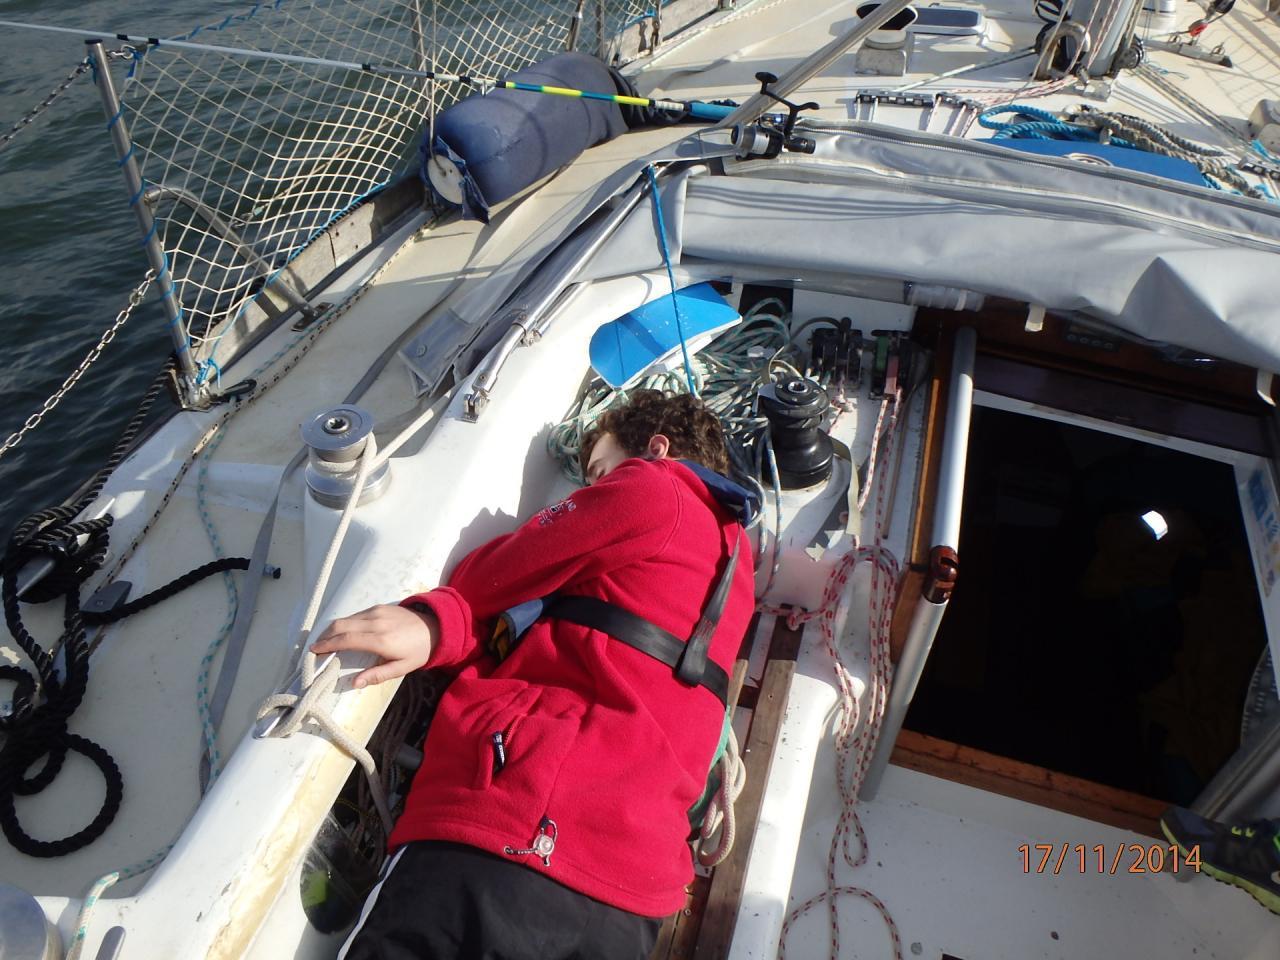 En route pour Porto : Youenn a le mal de mer